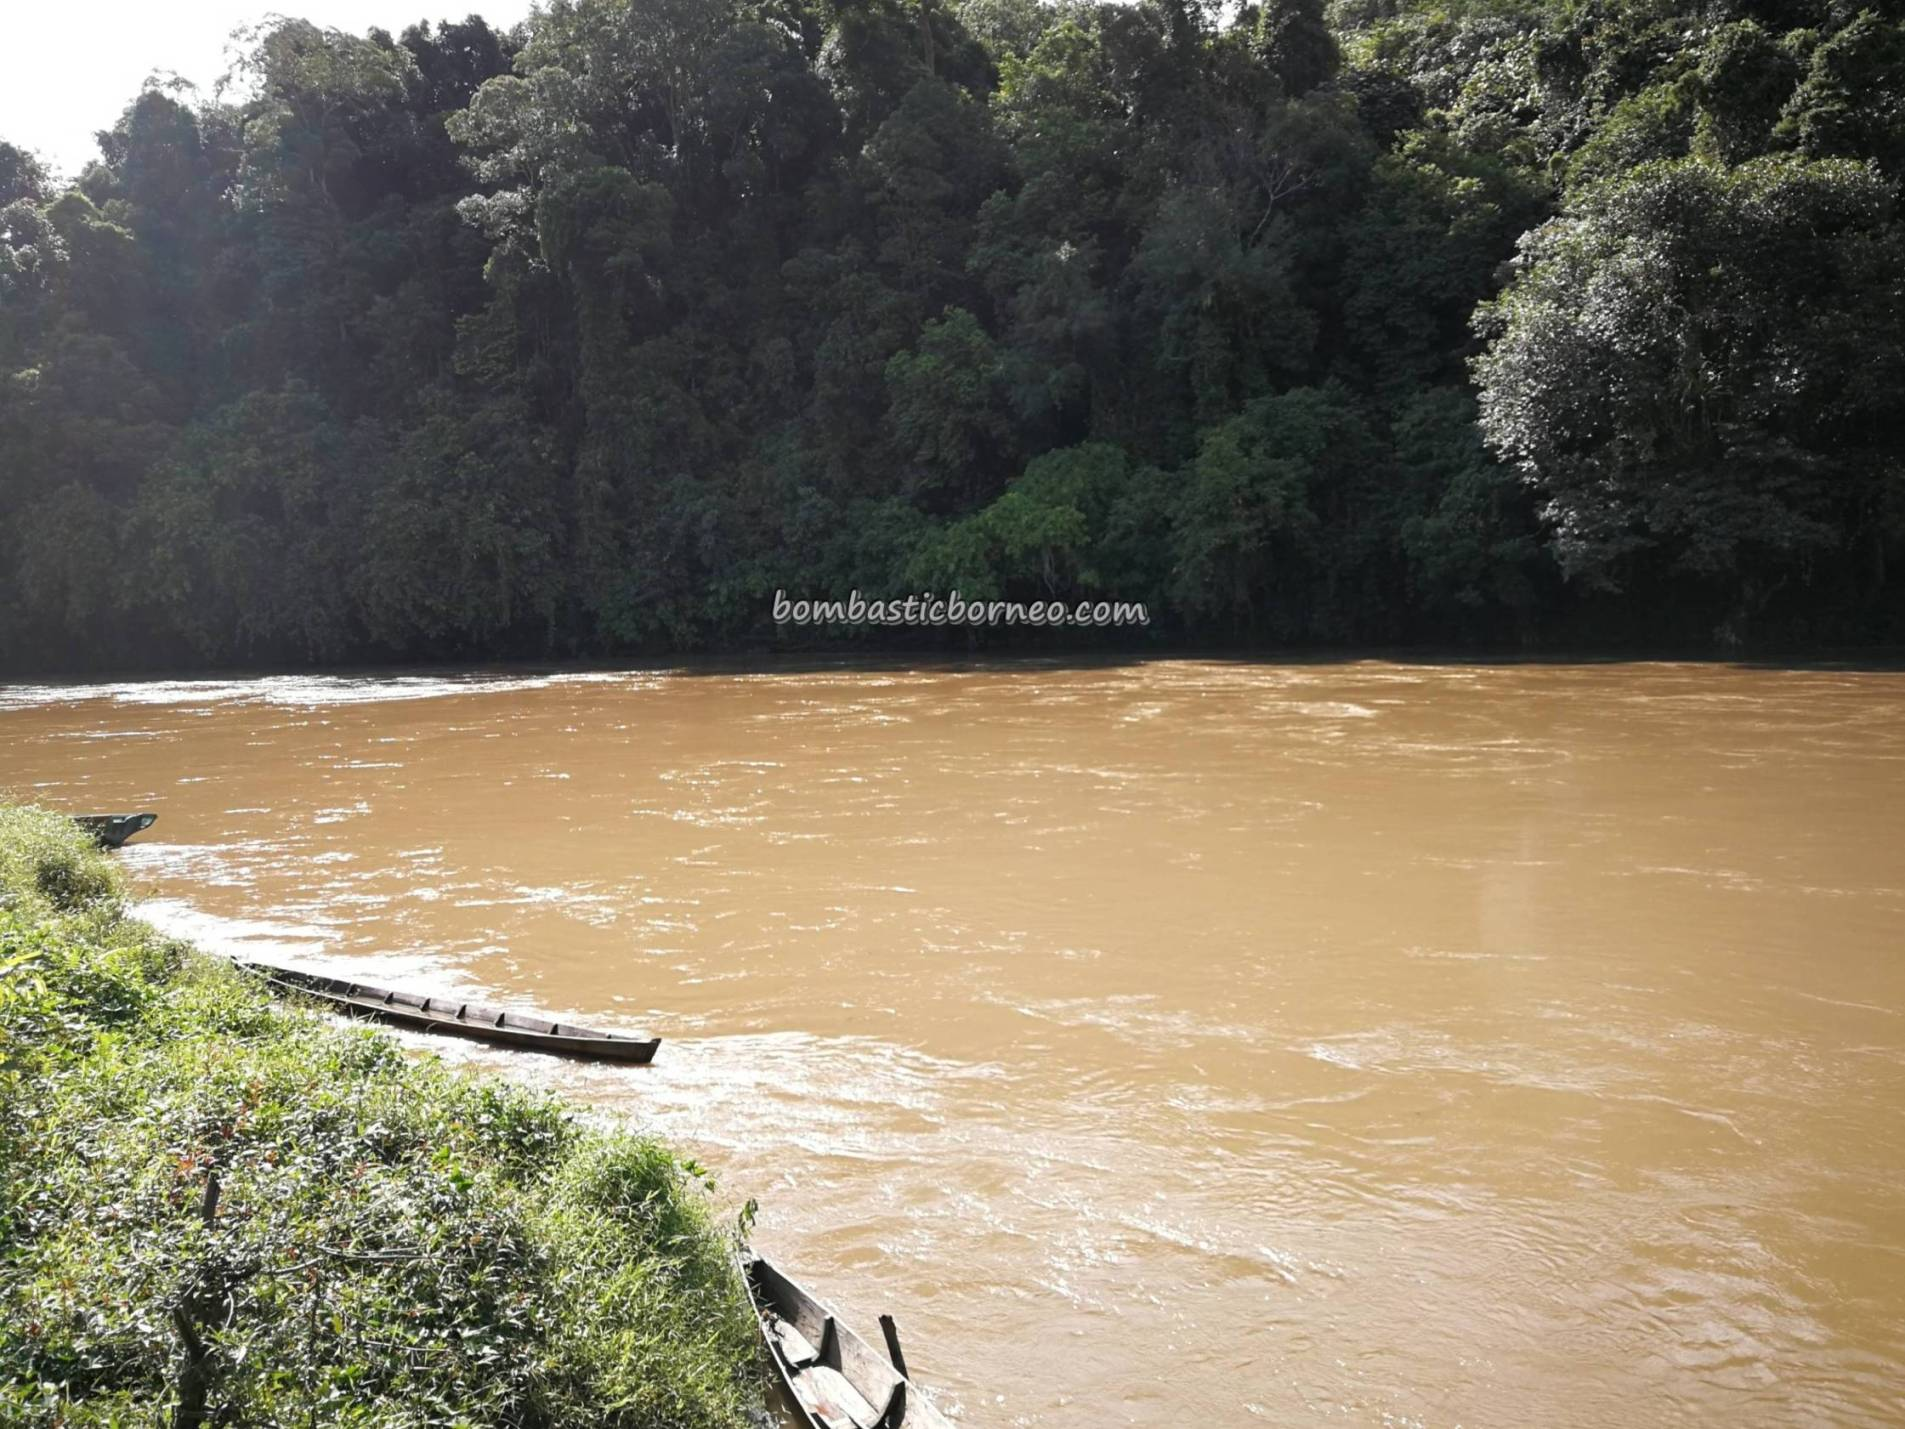 Rapids, Sungai Kereho, Keriau river, backpackers, destination, Borneo, Indonesia, West Kalimantan, Kapuas Hulu, Tourism, tourist attraction, travel guide, crossborder, 印尼西加里曼丹, 婆羅洲急流